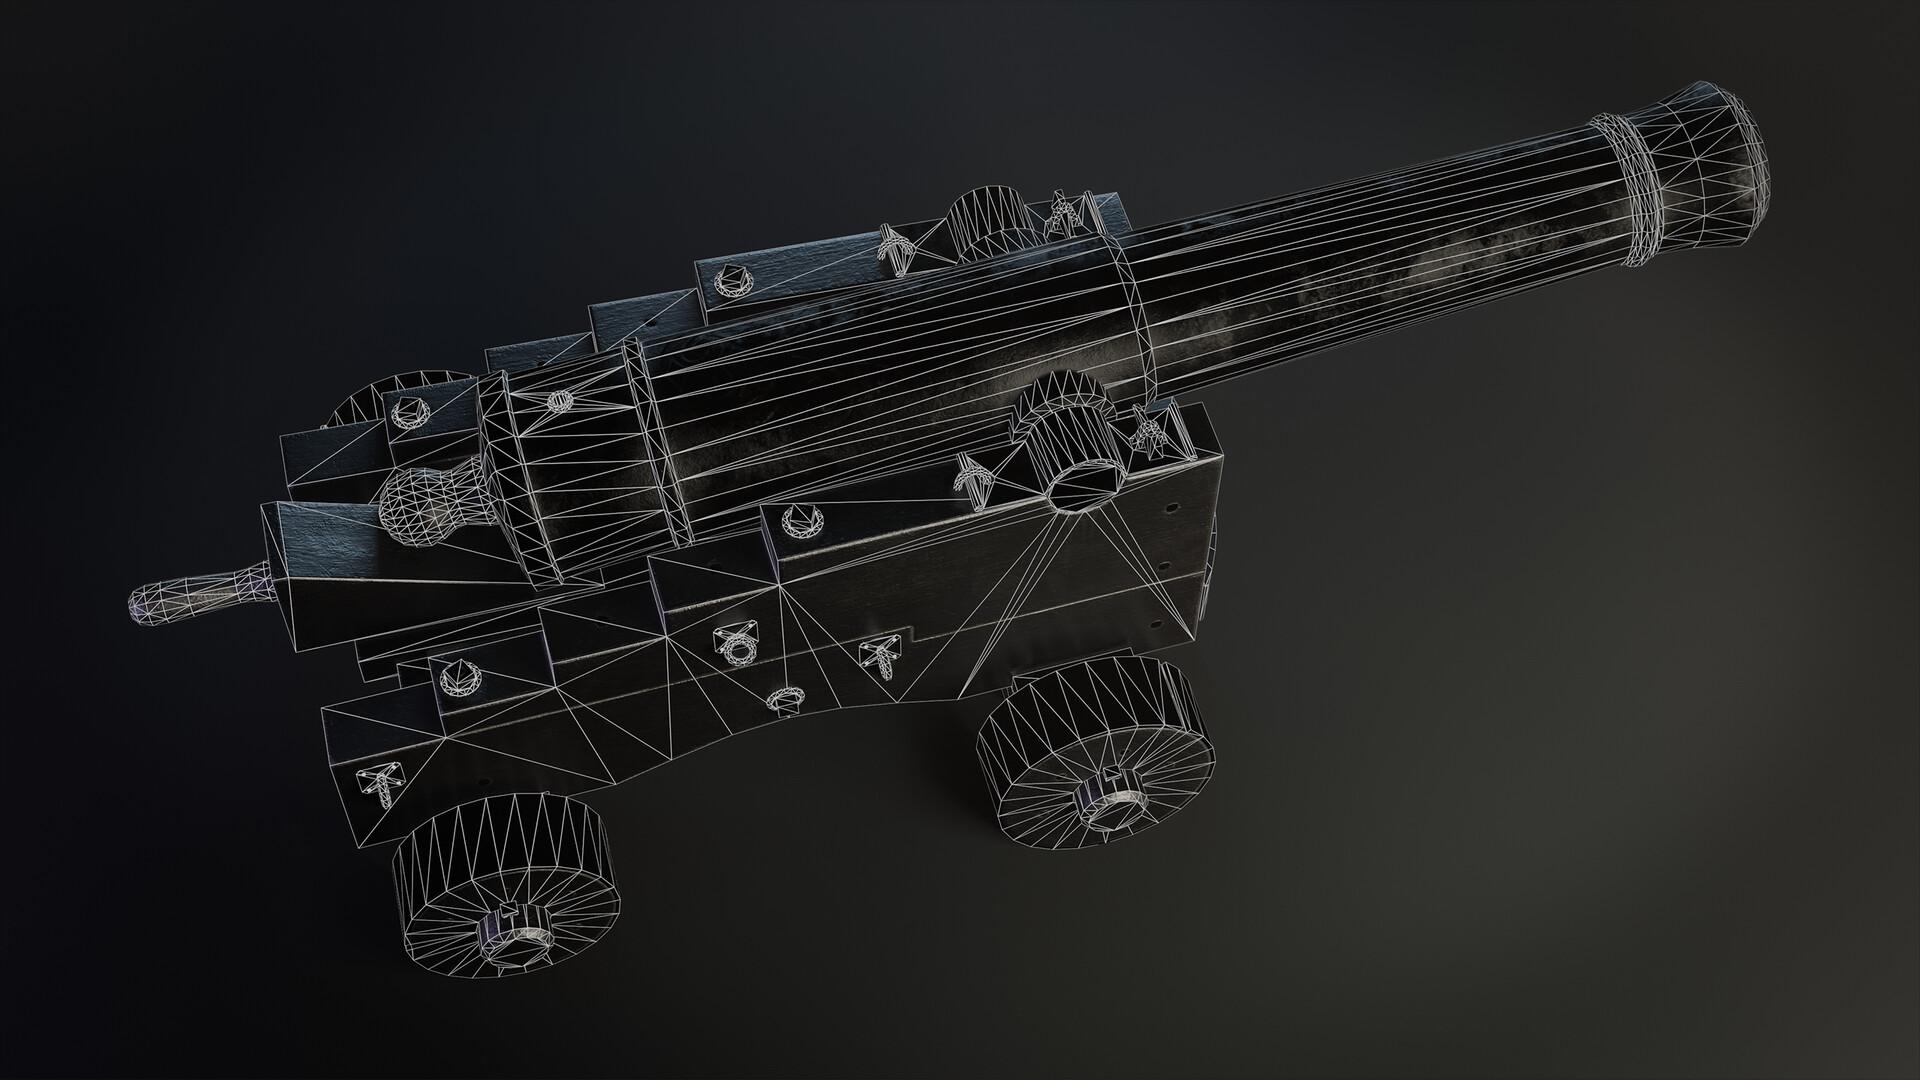 Pavel mazanik naval cannon render wire 01